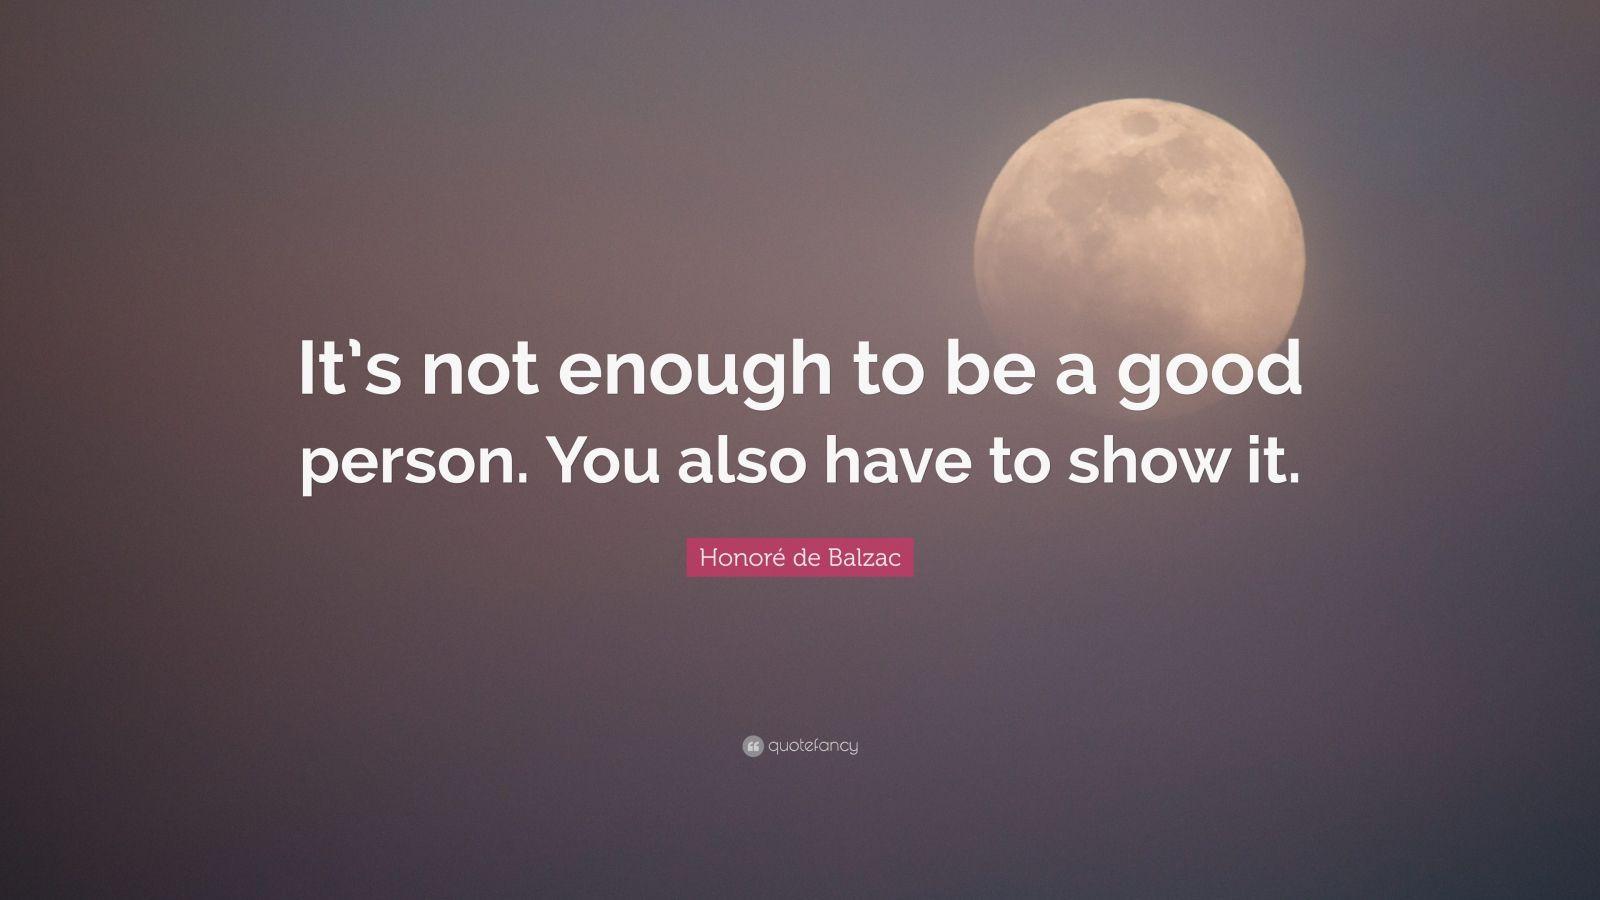 honoré de balzac quote it s not enough to be a good